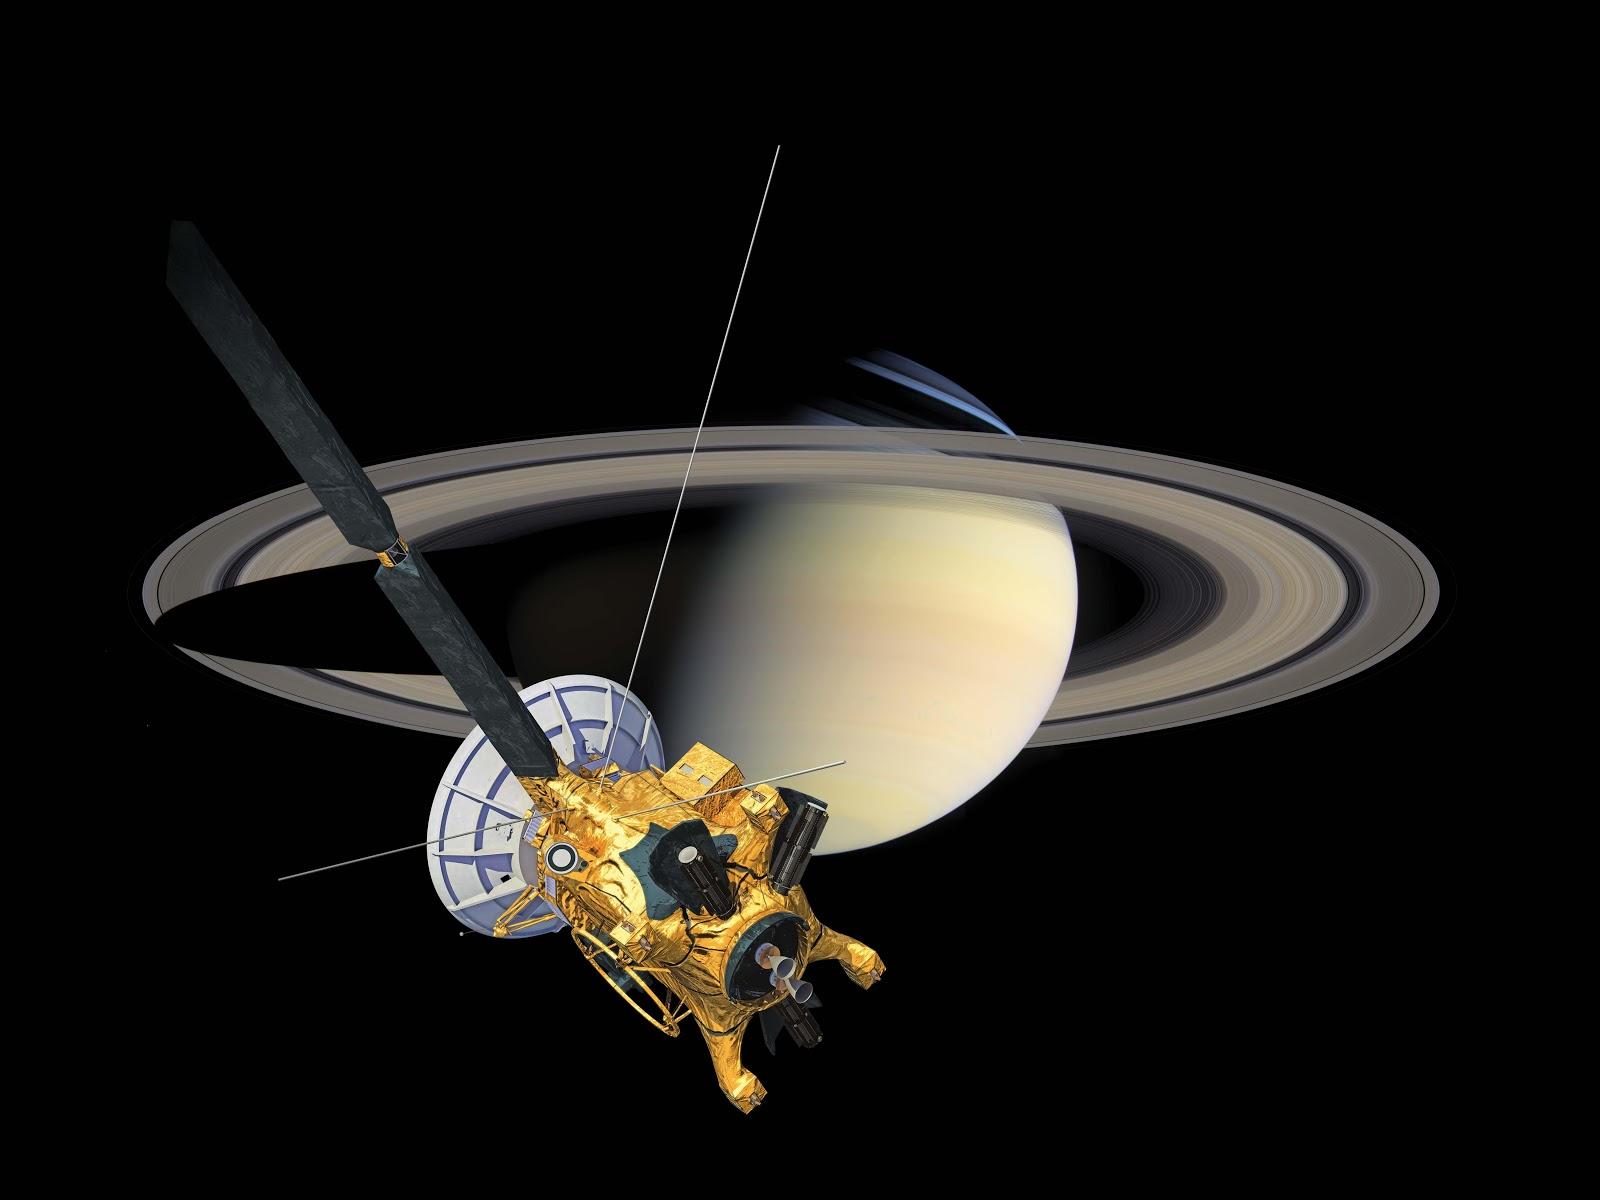 saturn probe - photo #11